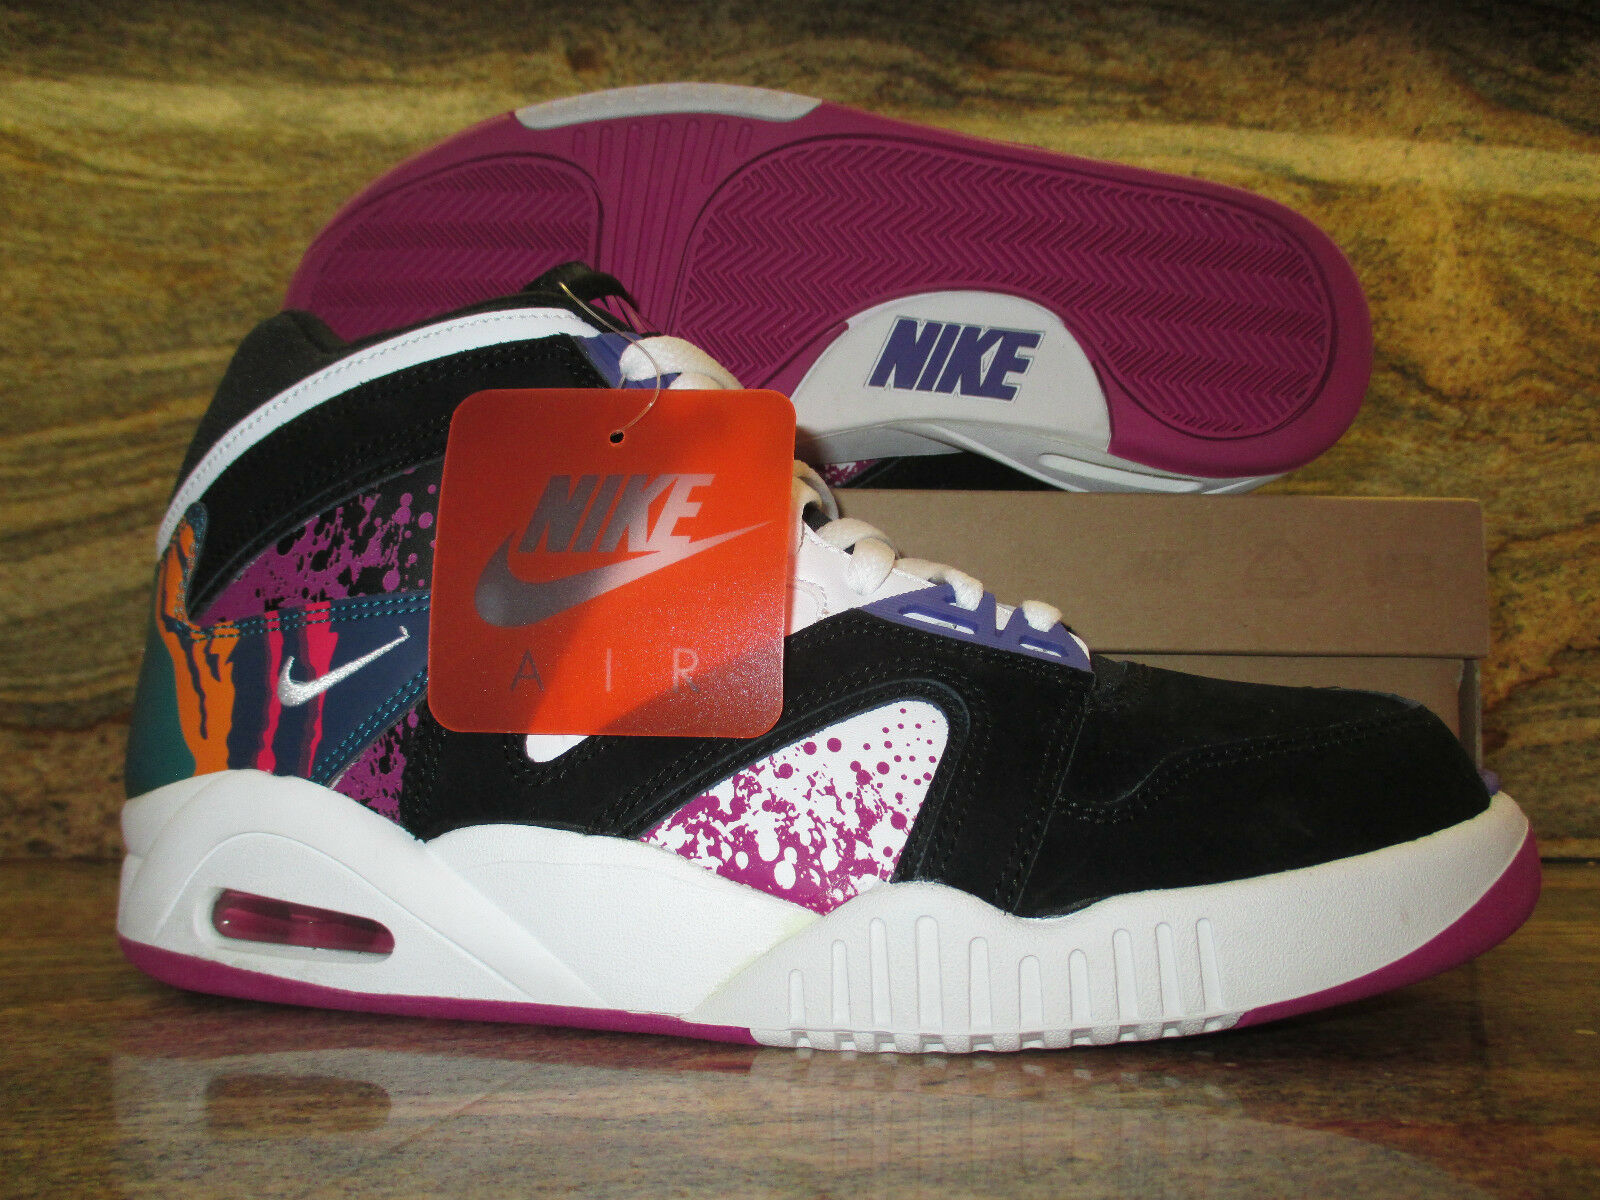 2009 Nike Air Tech Challenge Hybrid Price reduction